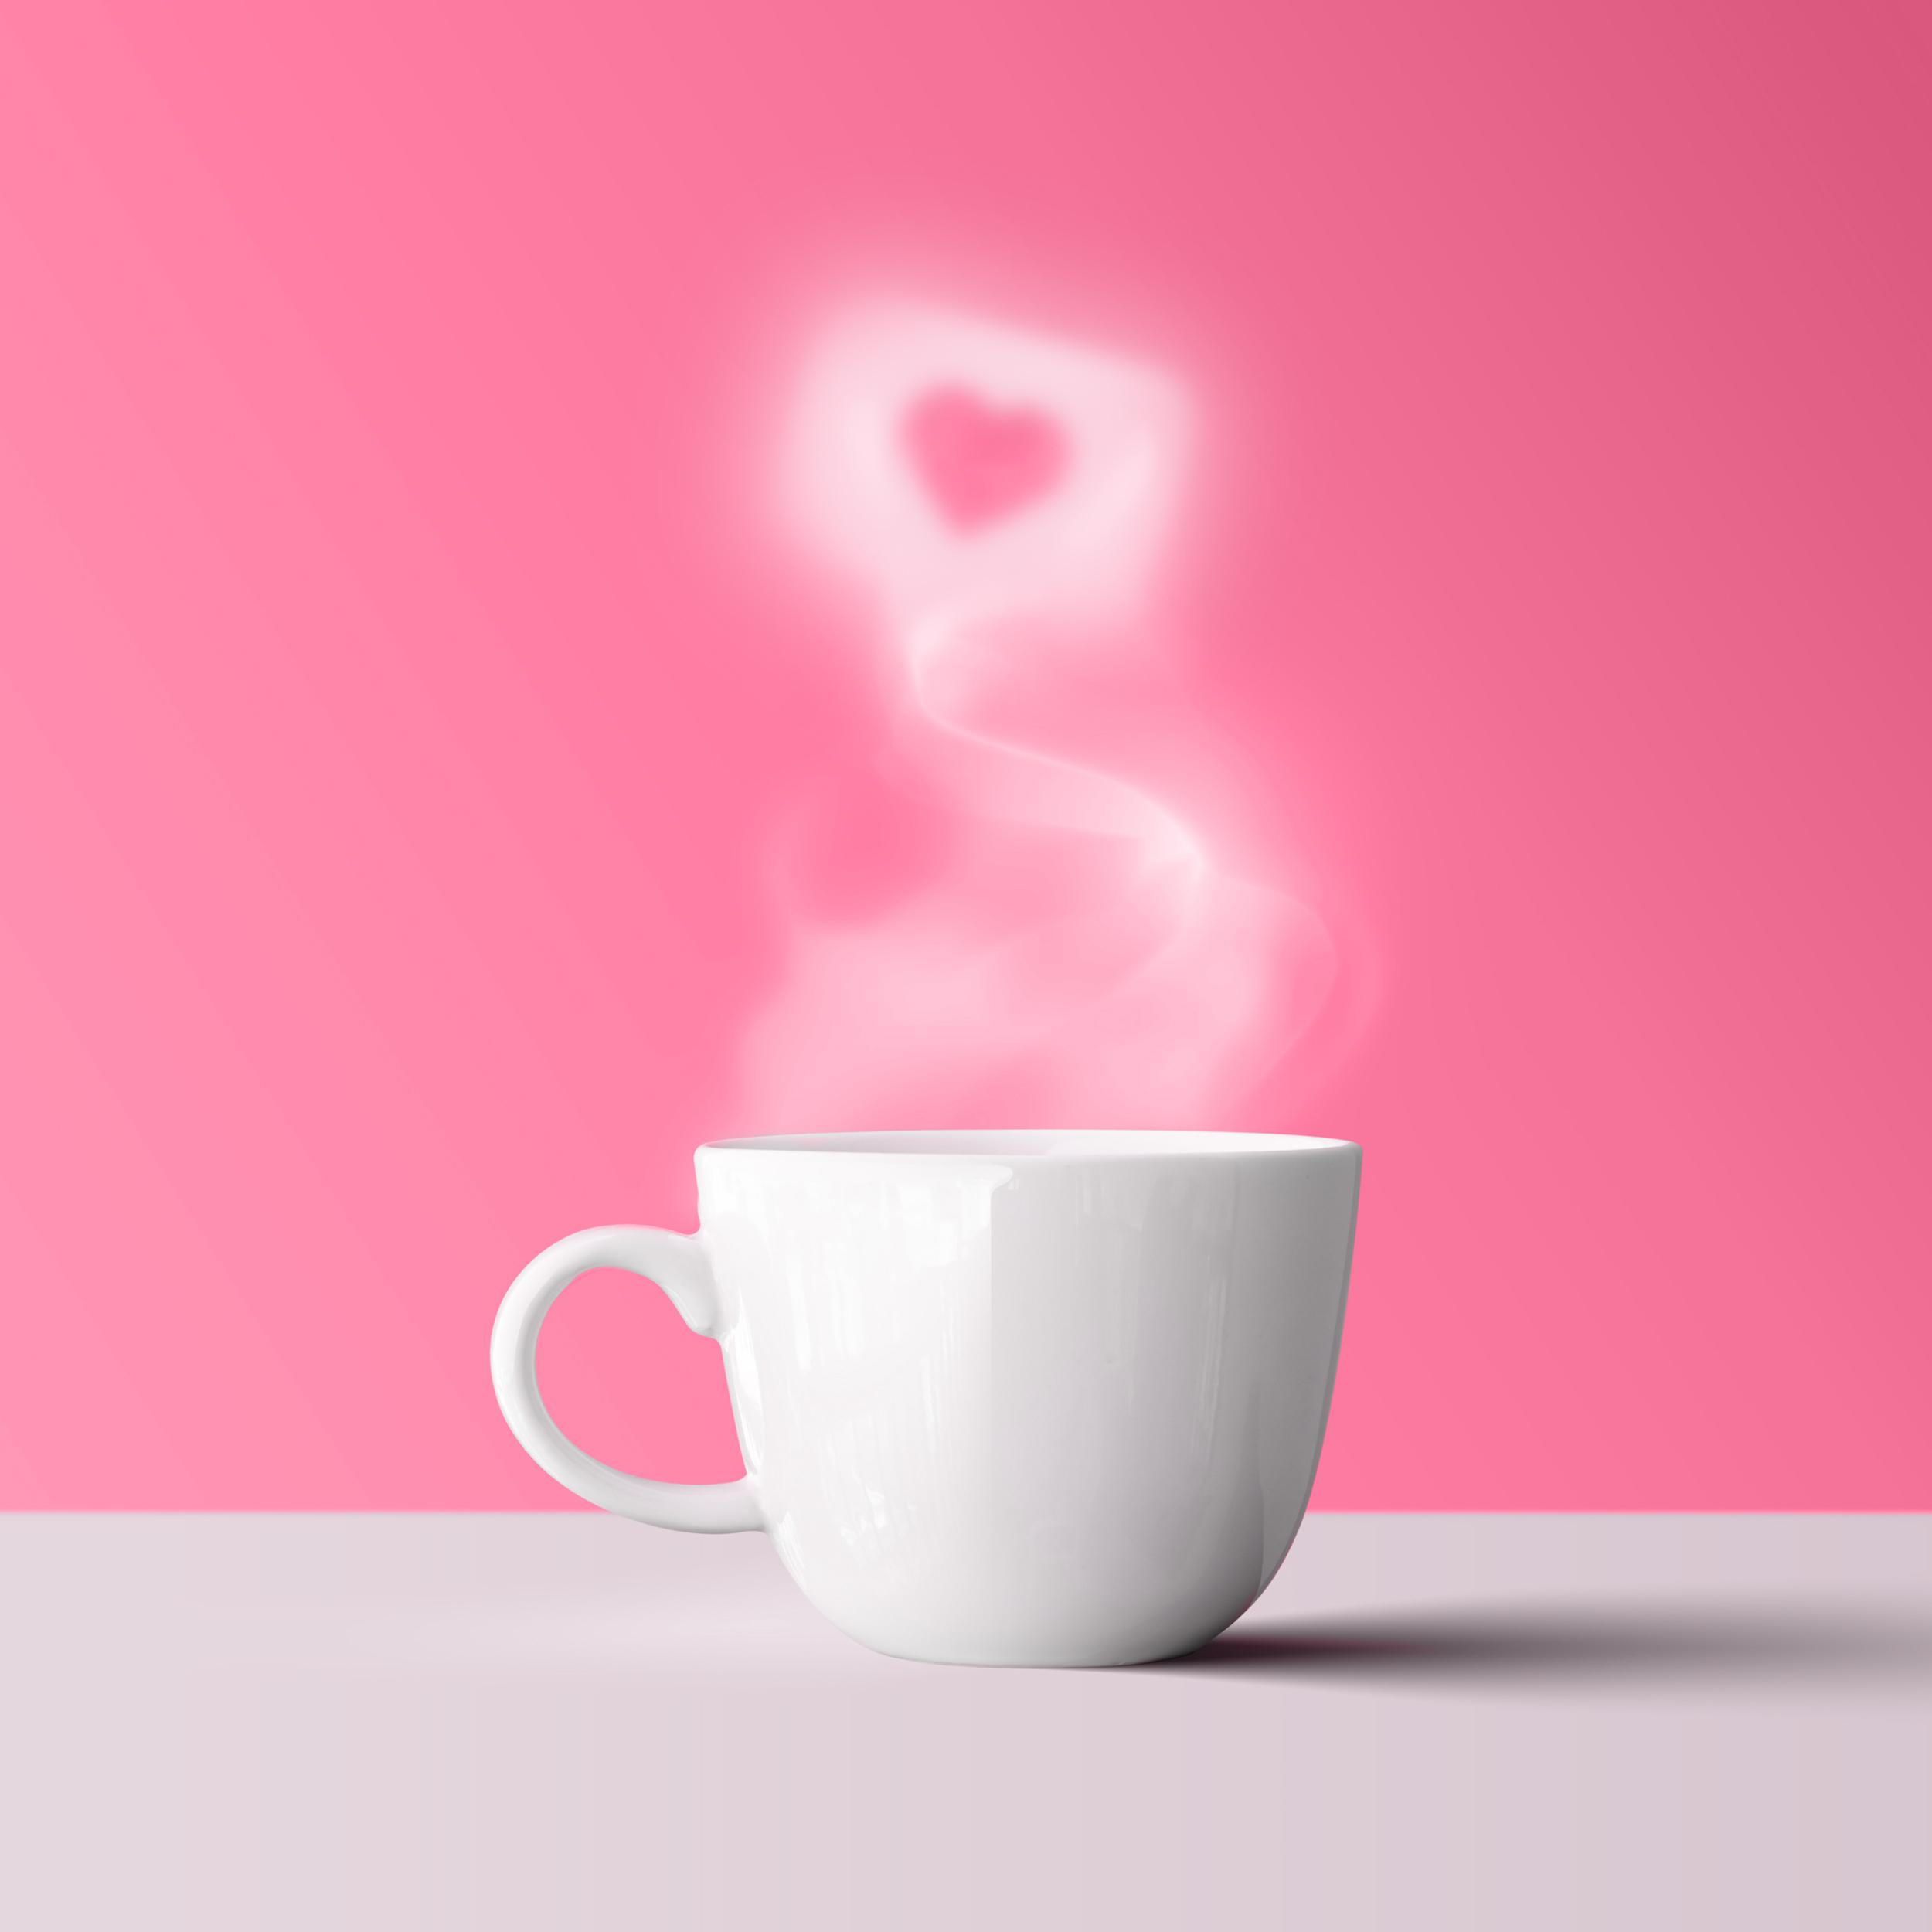 Content in your Coffee break